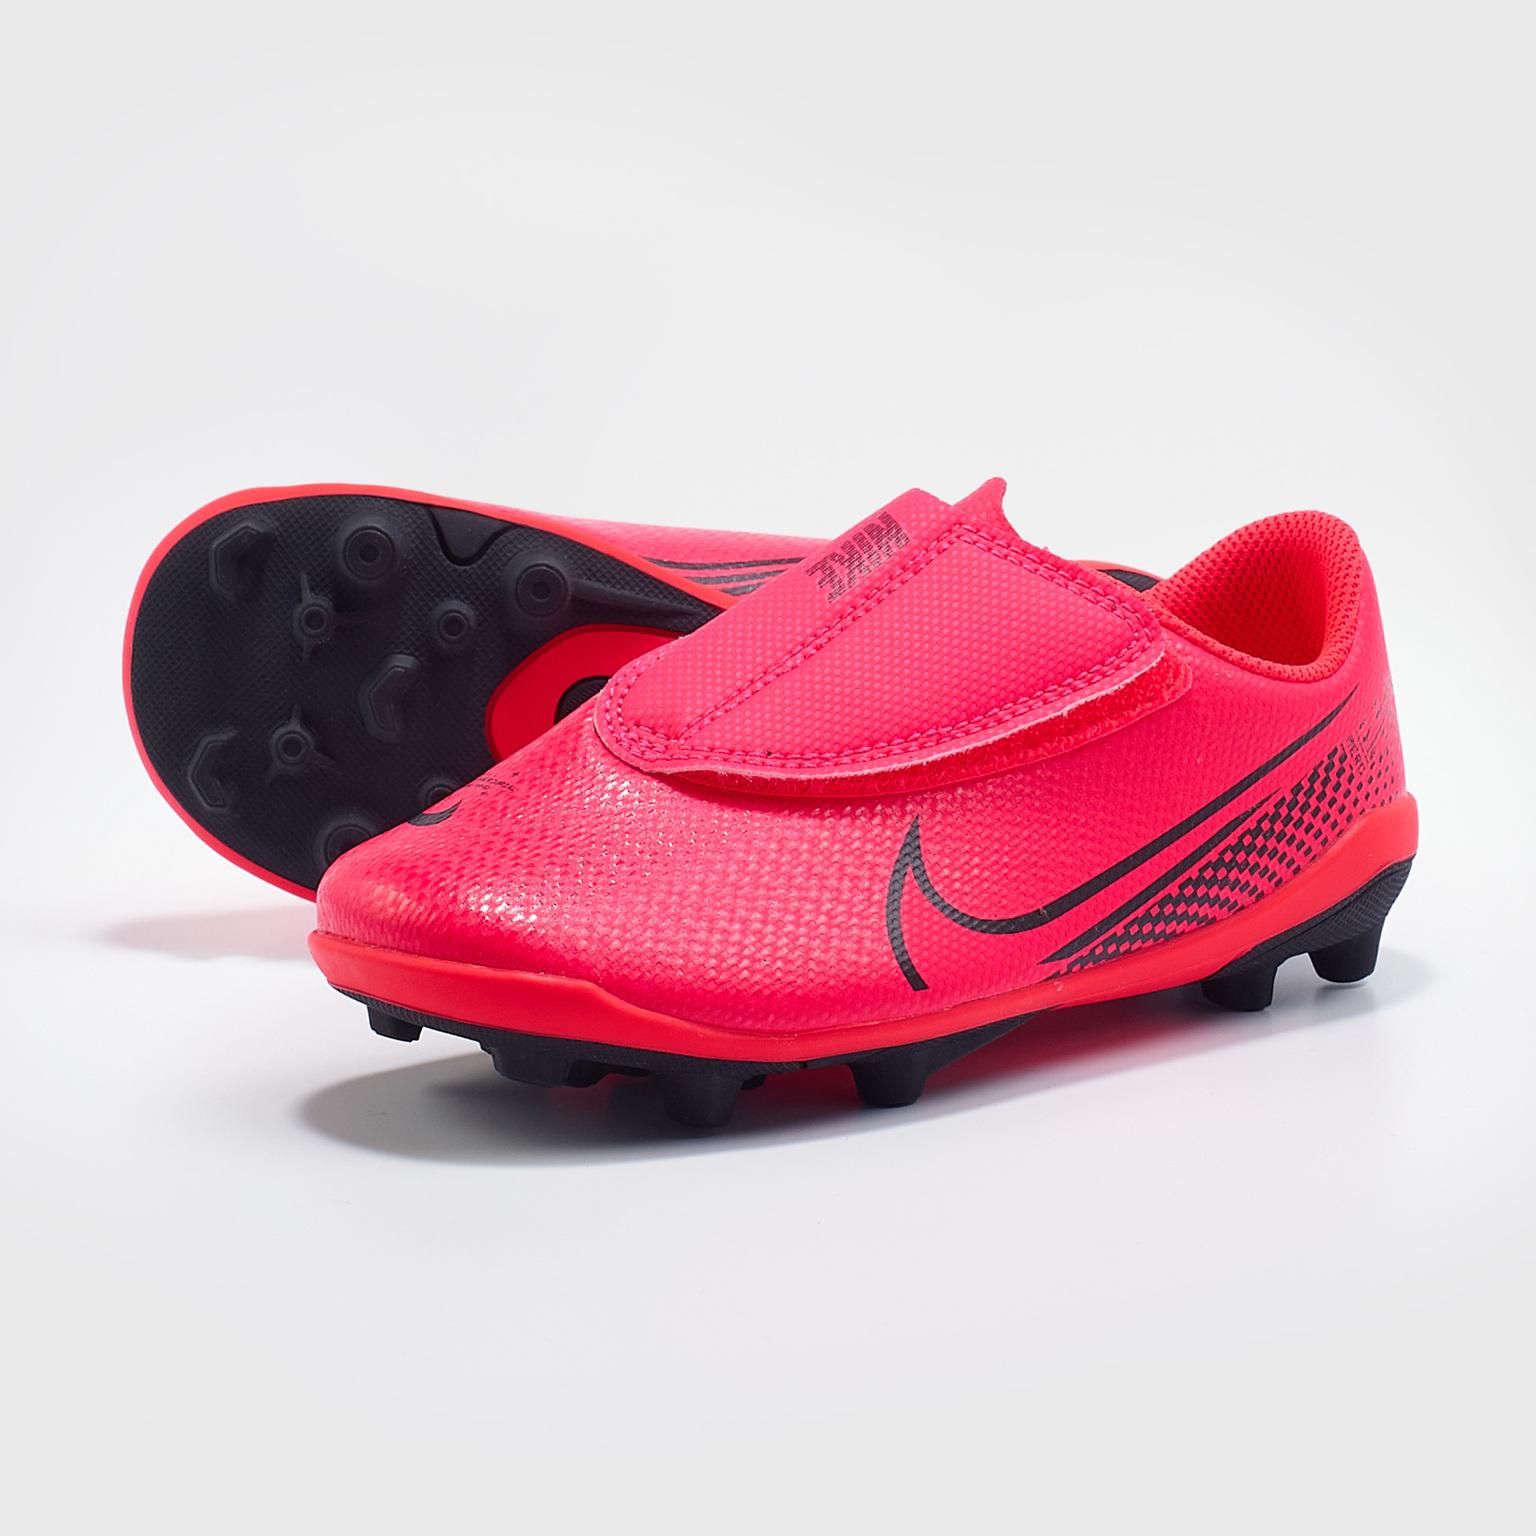 Бутсы детские Nike Vapor 13 Club MG PS AT8162-606 бутсы детские nike vapor 13 club mg ps at8162 010